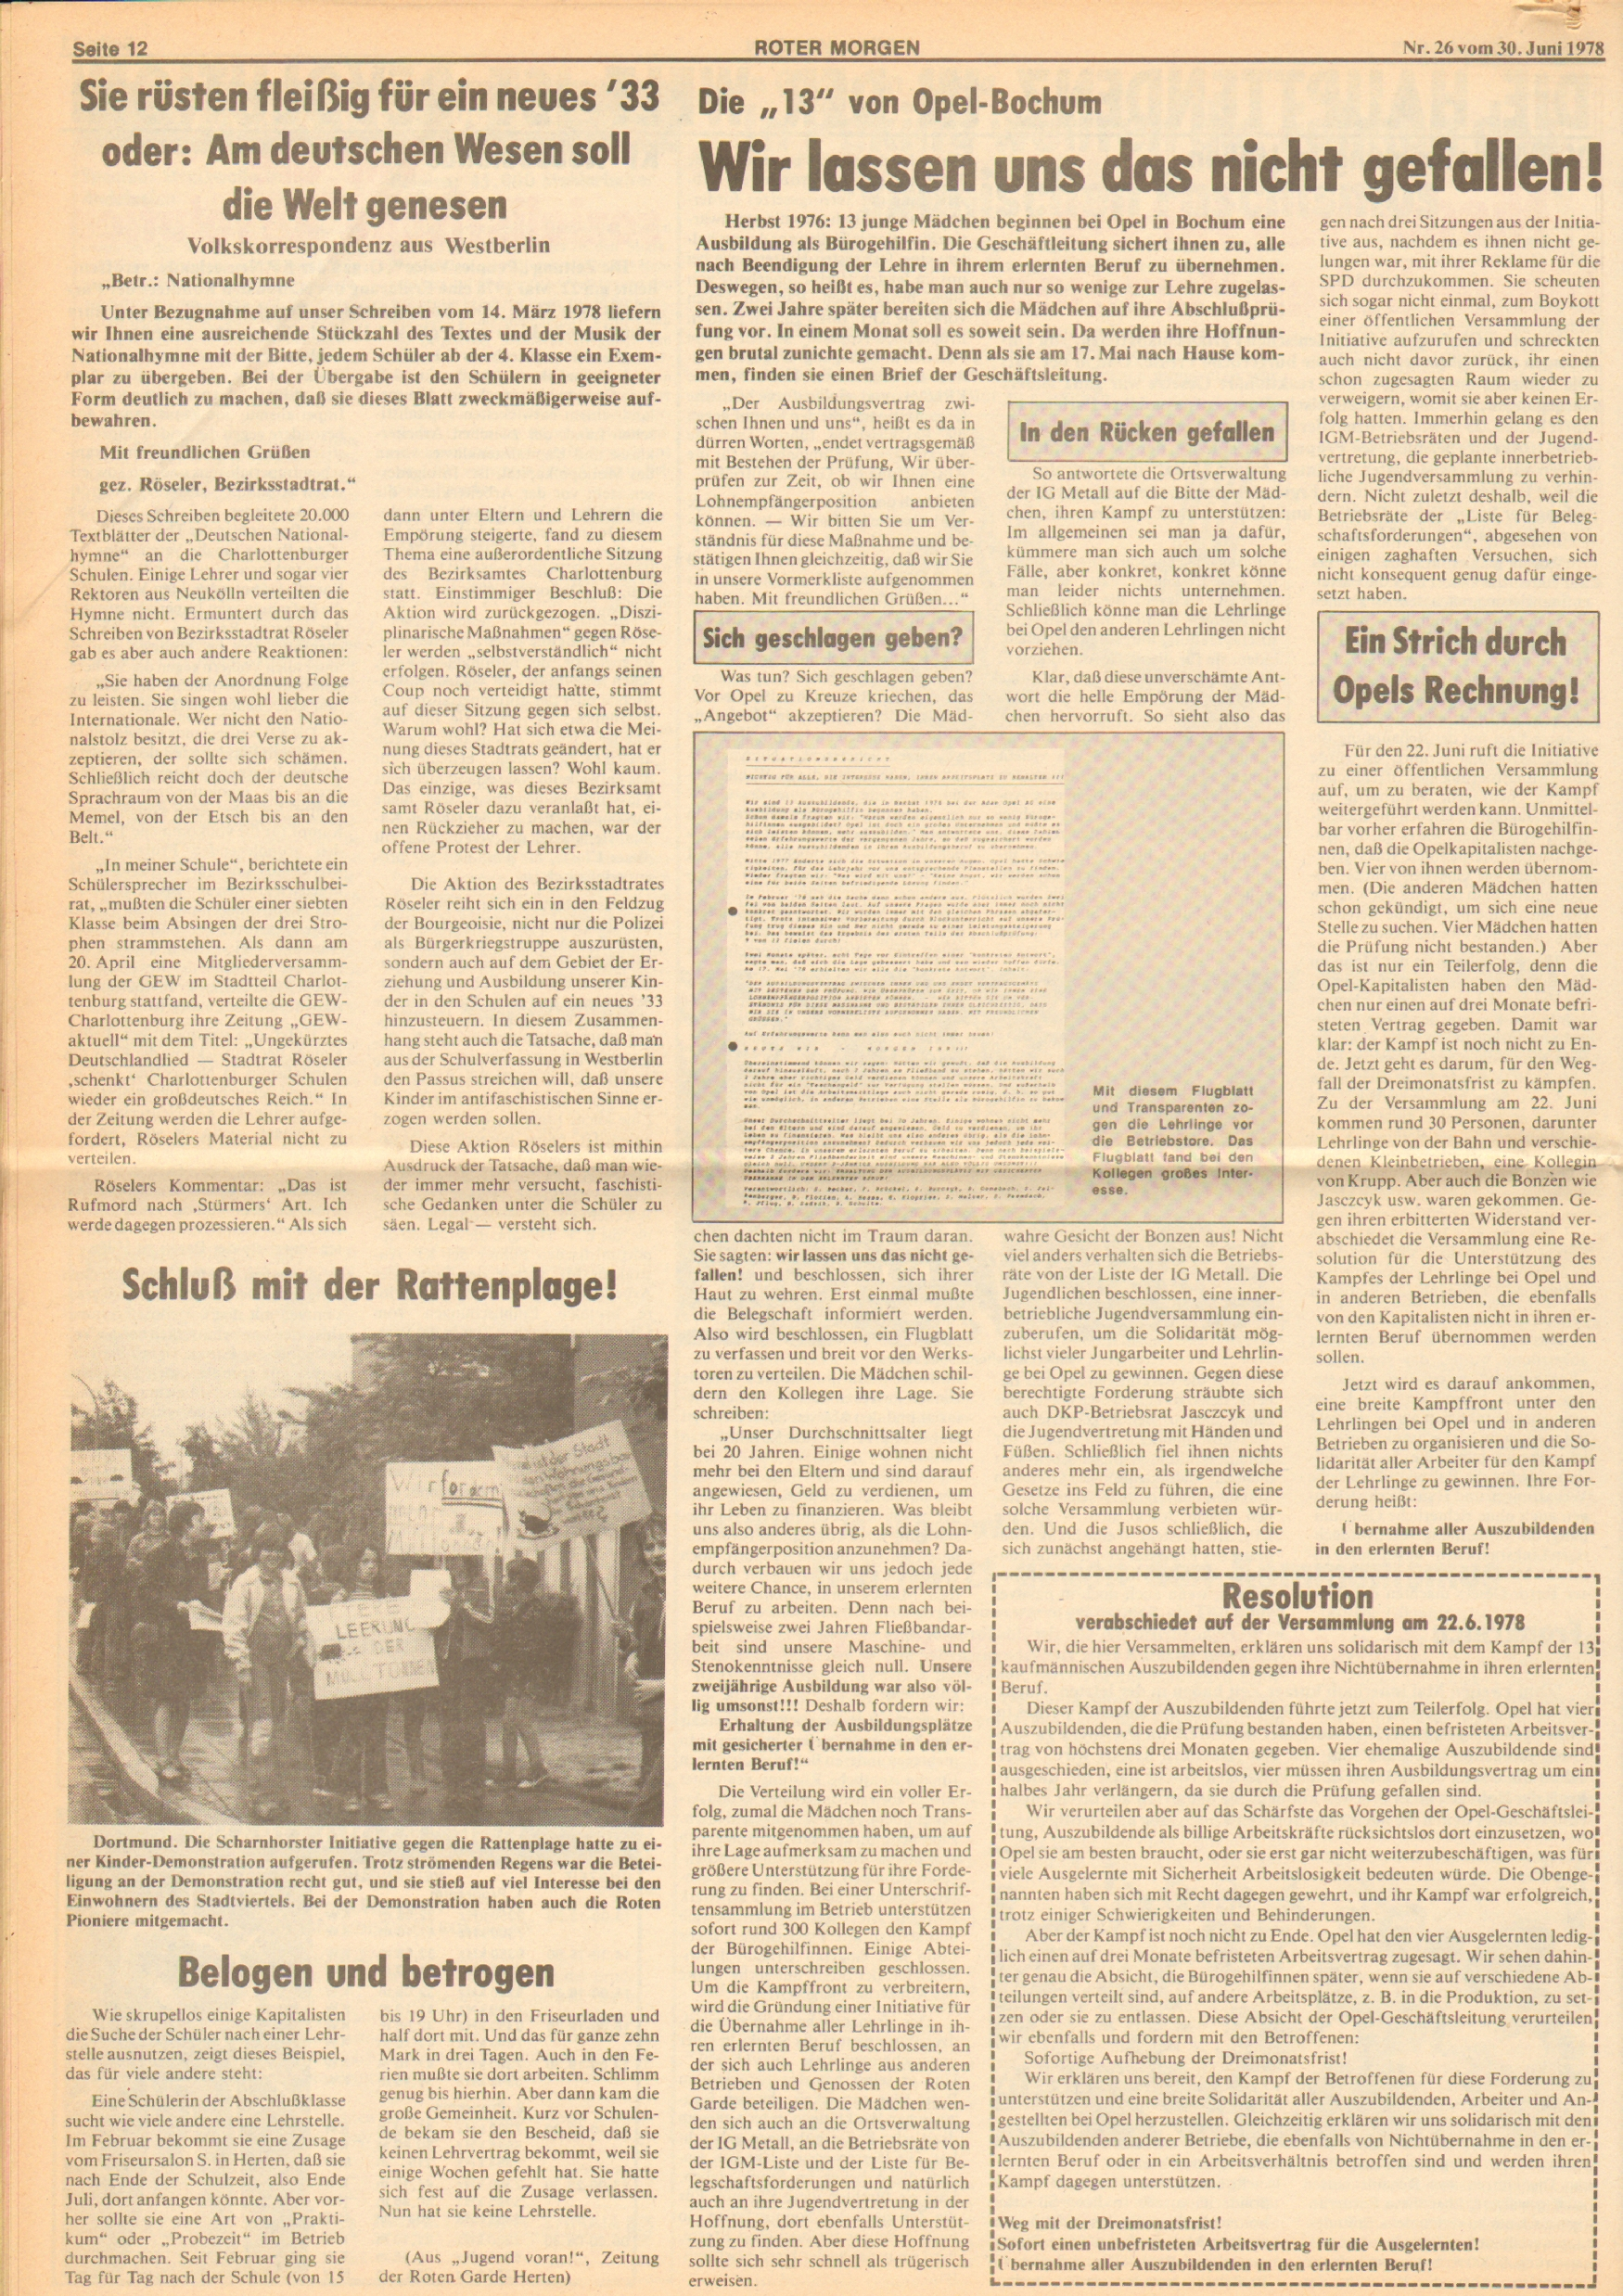 Roter Morgen, 12. Jg., 30. Juni 1978, Nr. 26, Seite 12